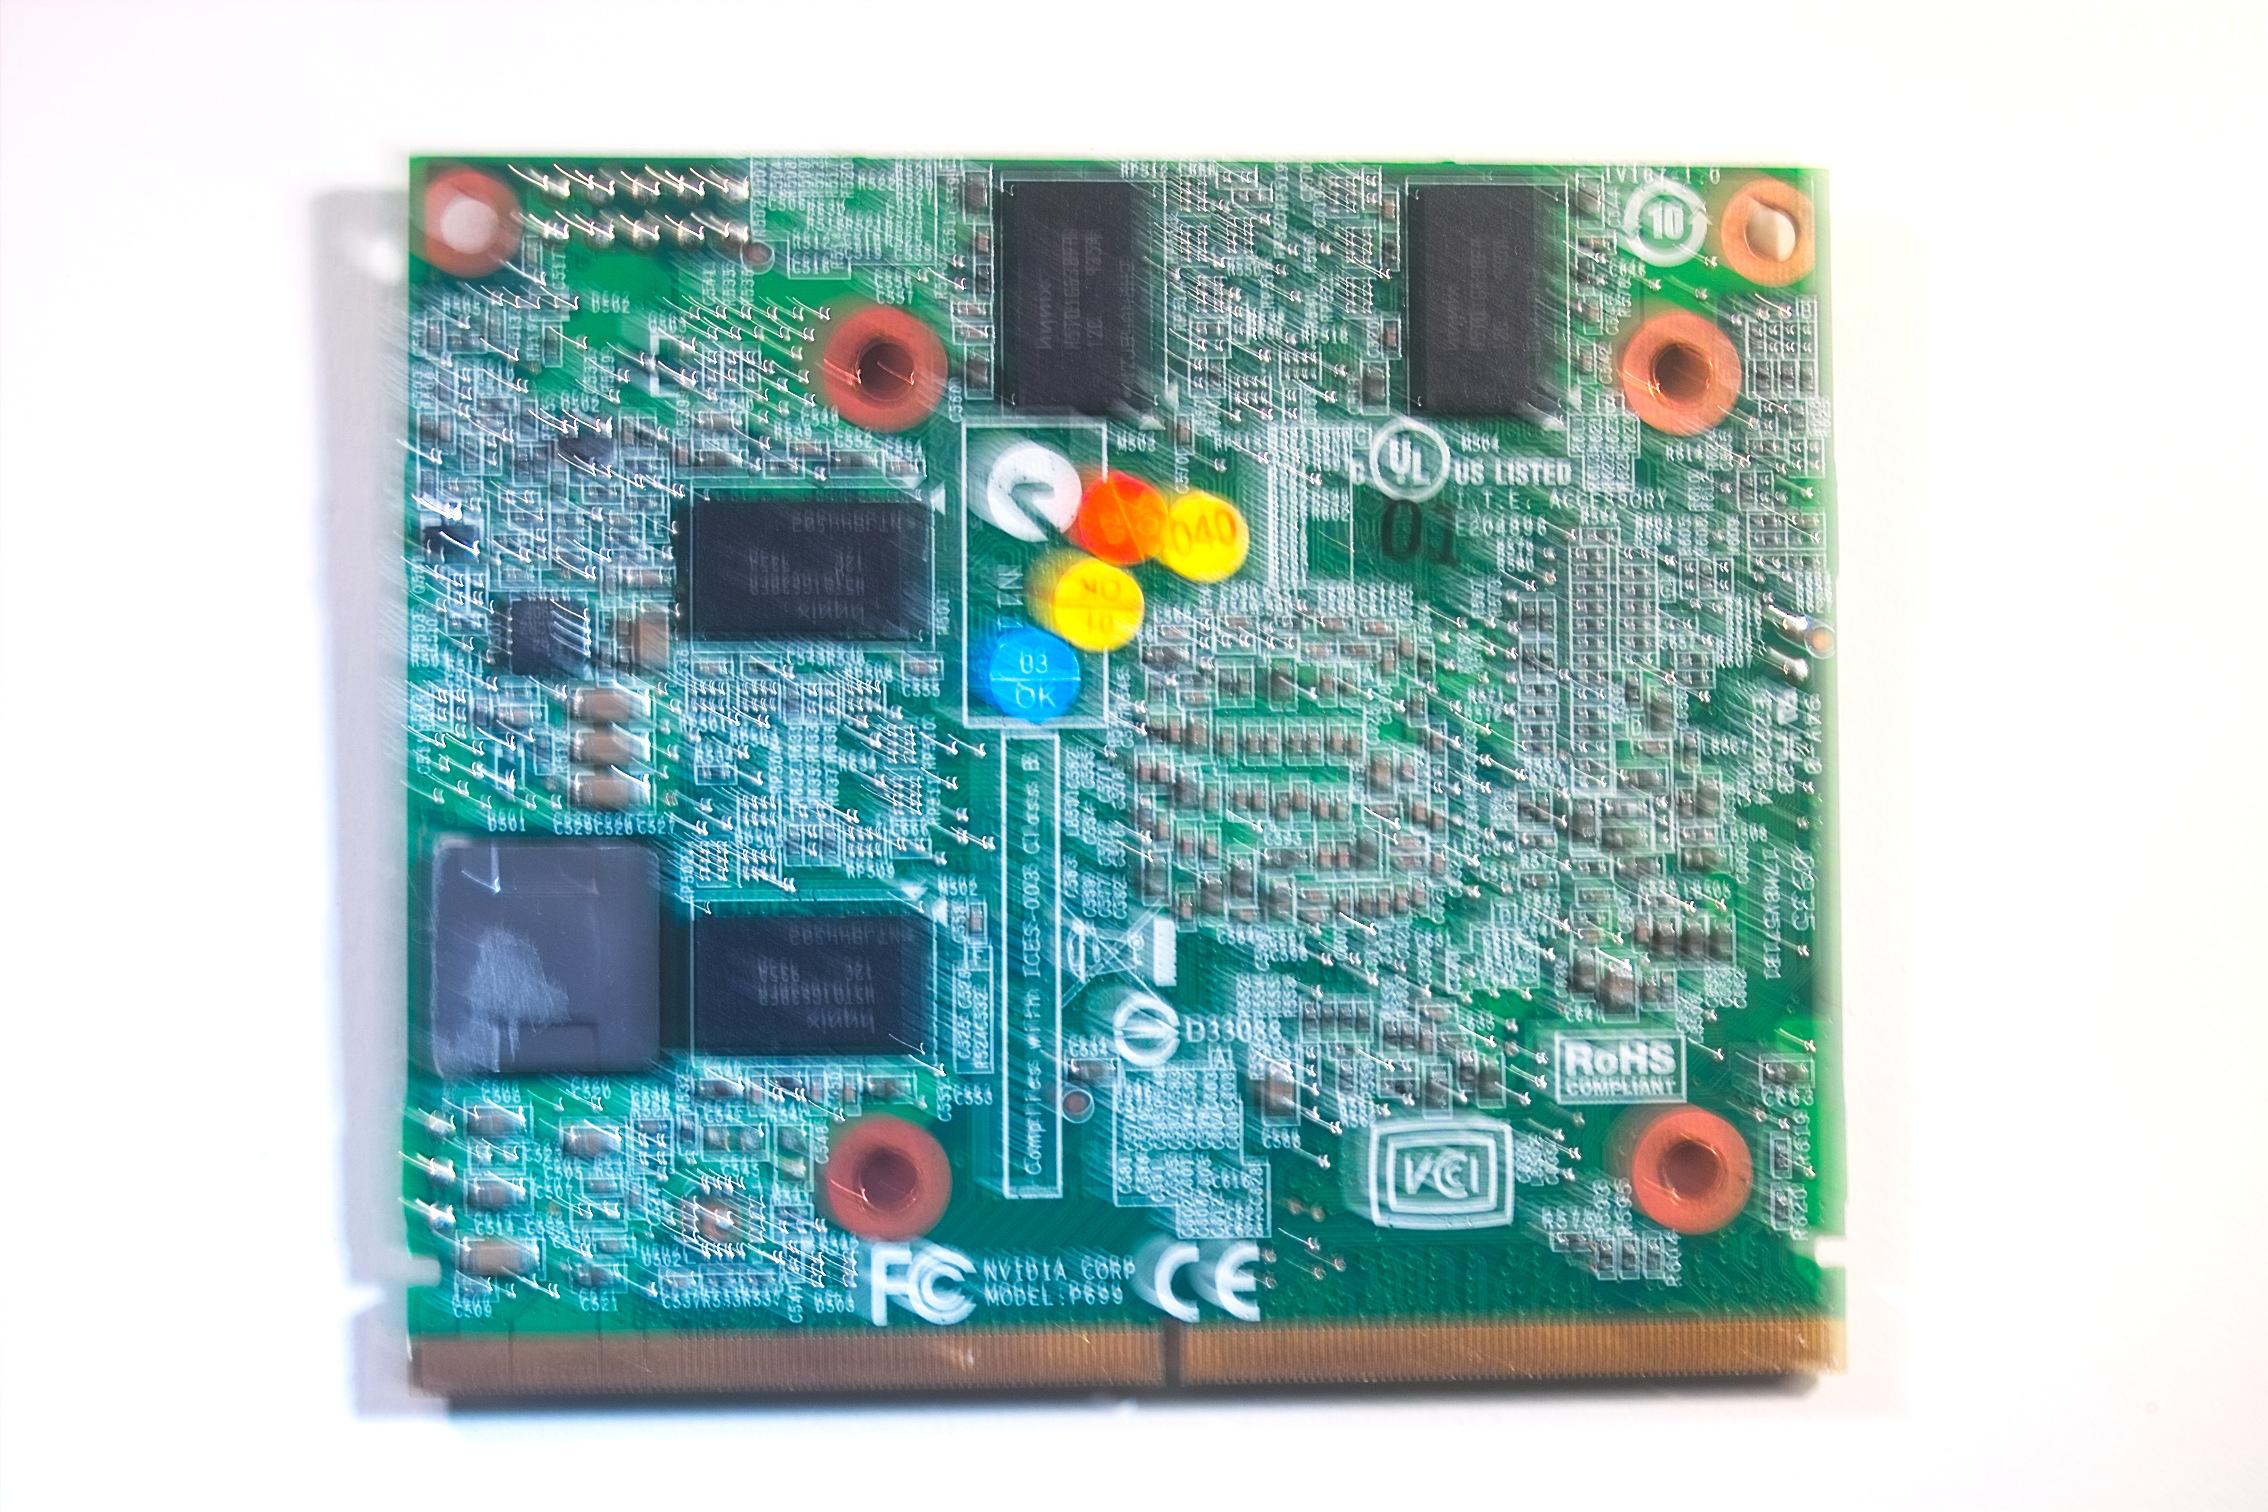 Nvidia geforce gt240m 1024mb mxm grafikkarte asus x62j x64vn n61vn n71